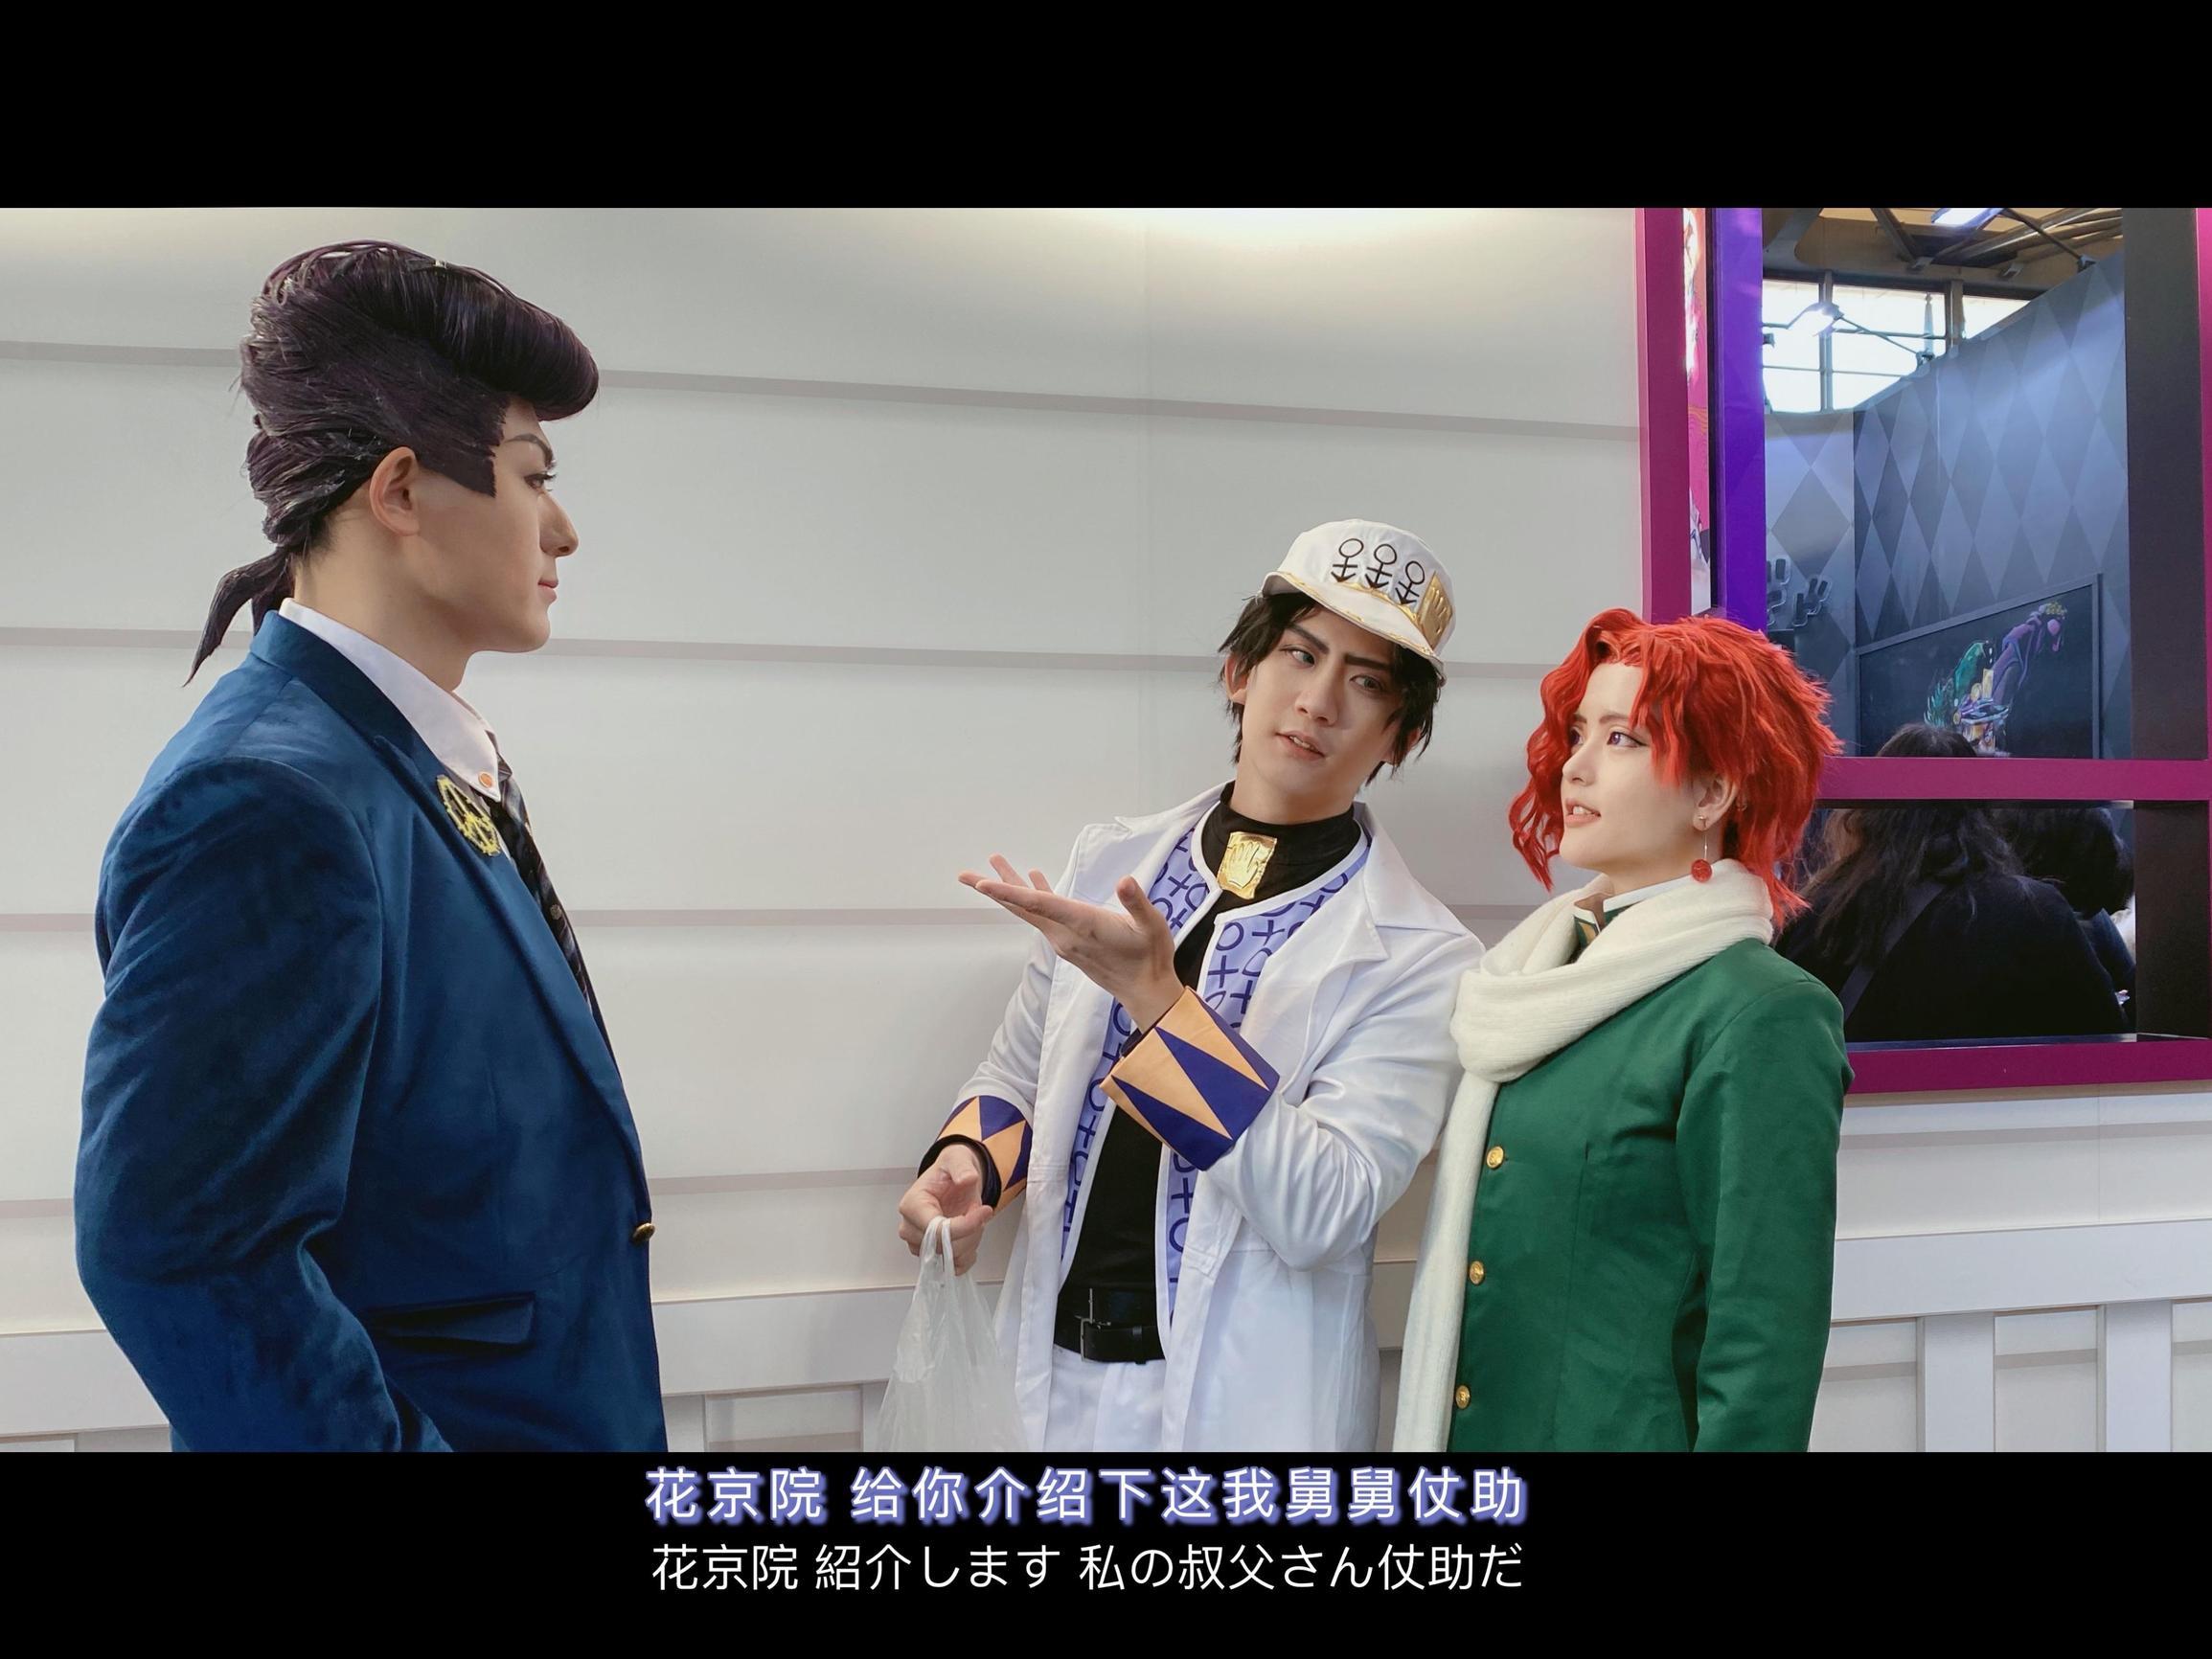 《JOJO的奇妙冒险》东方仗助cosplay【CN:小夕未希_miki】-第1张